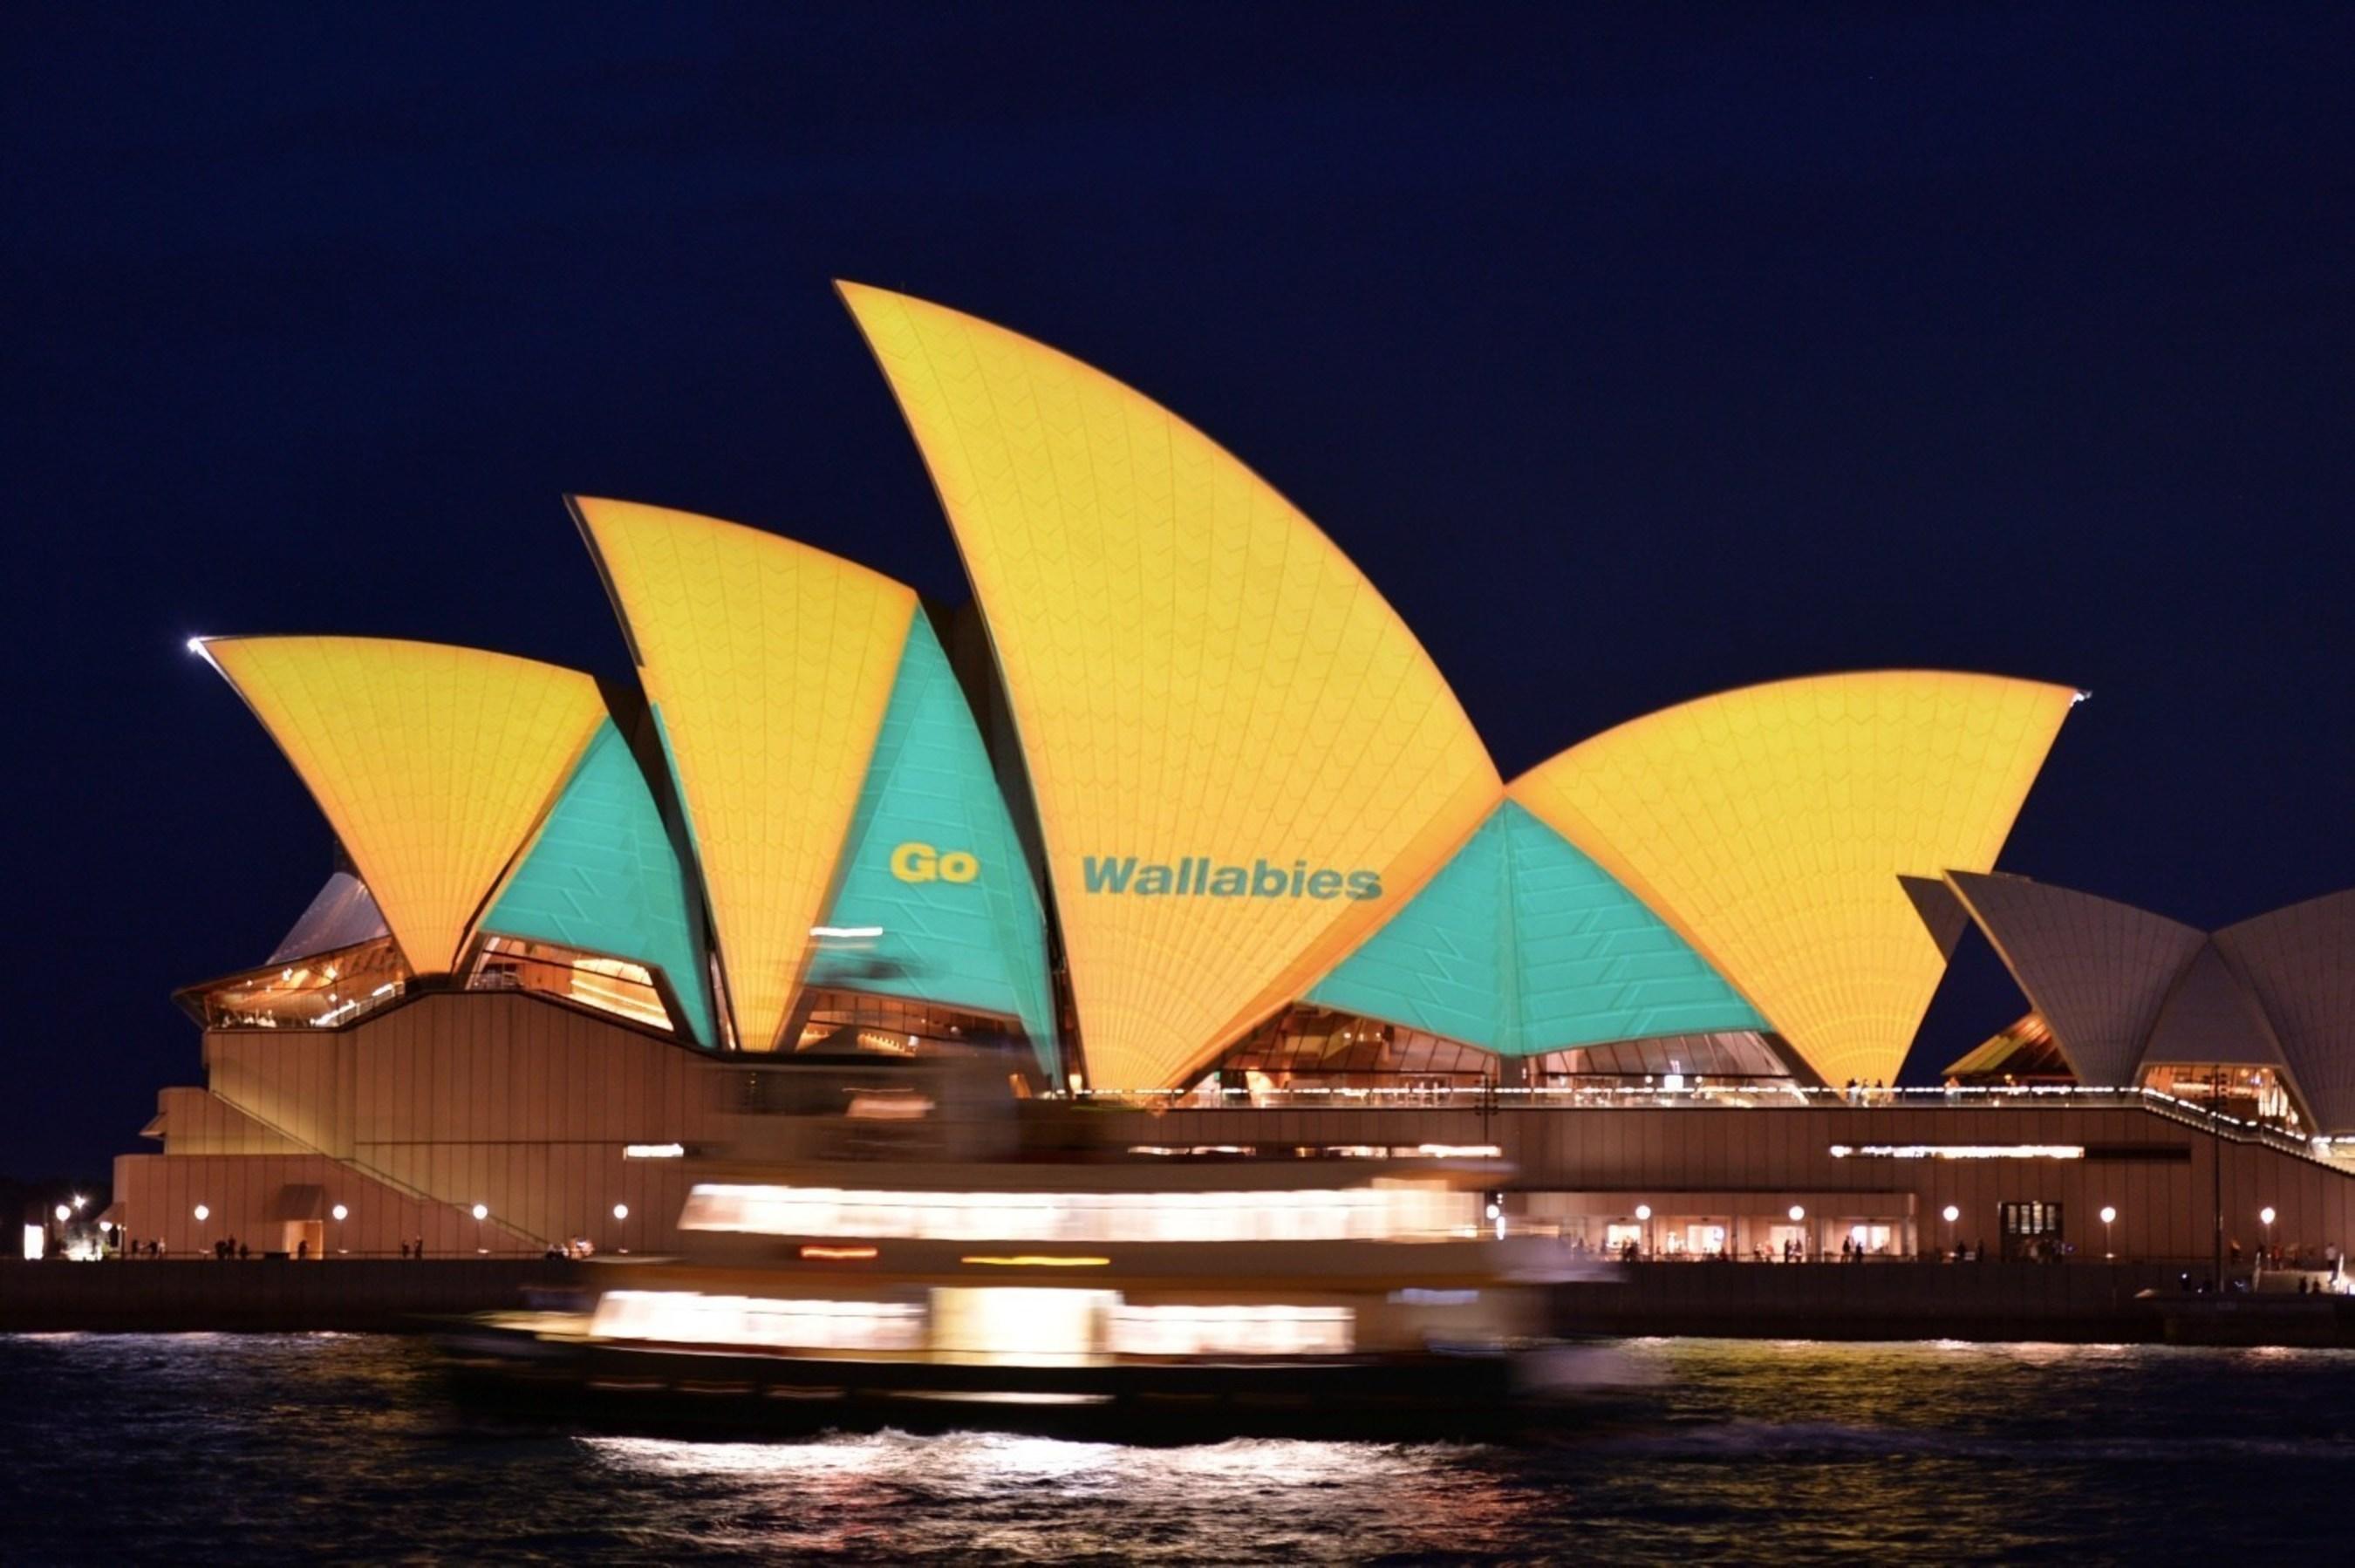 Sydney cheers on the Wallabies_Sydney Opera House_Destination NSW James Morgan (2)